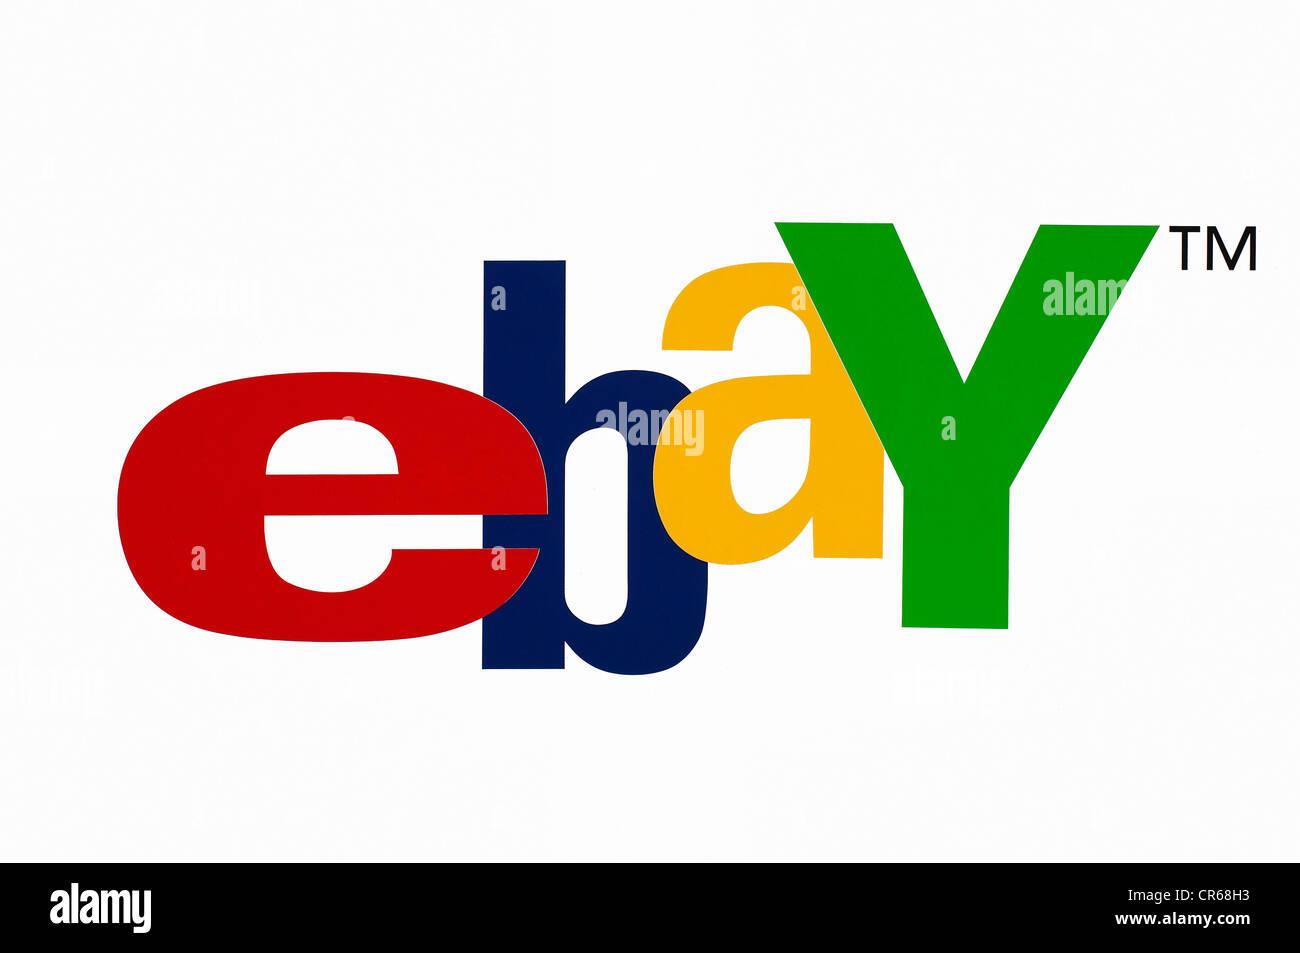 Ebay logo, American online auction website - Stock Image